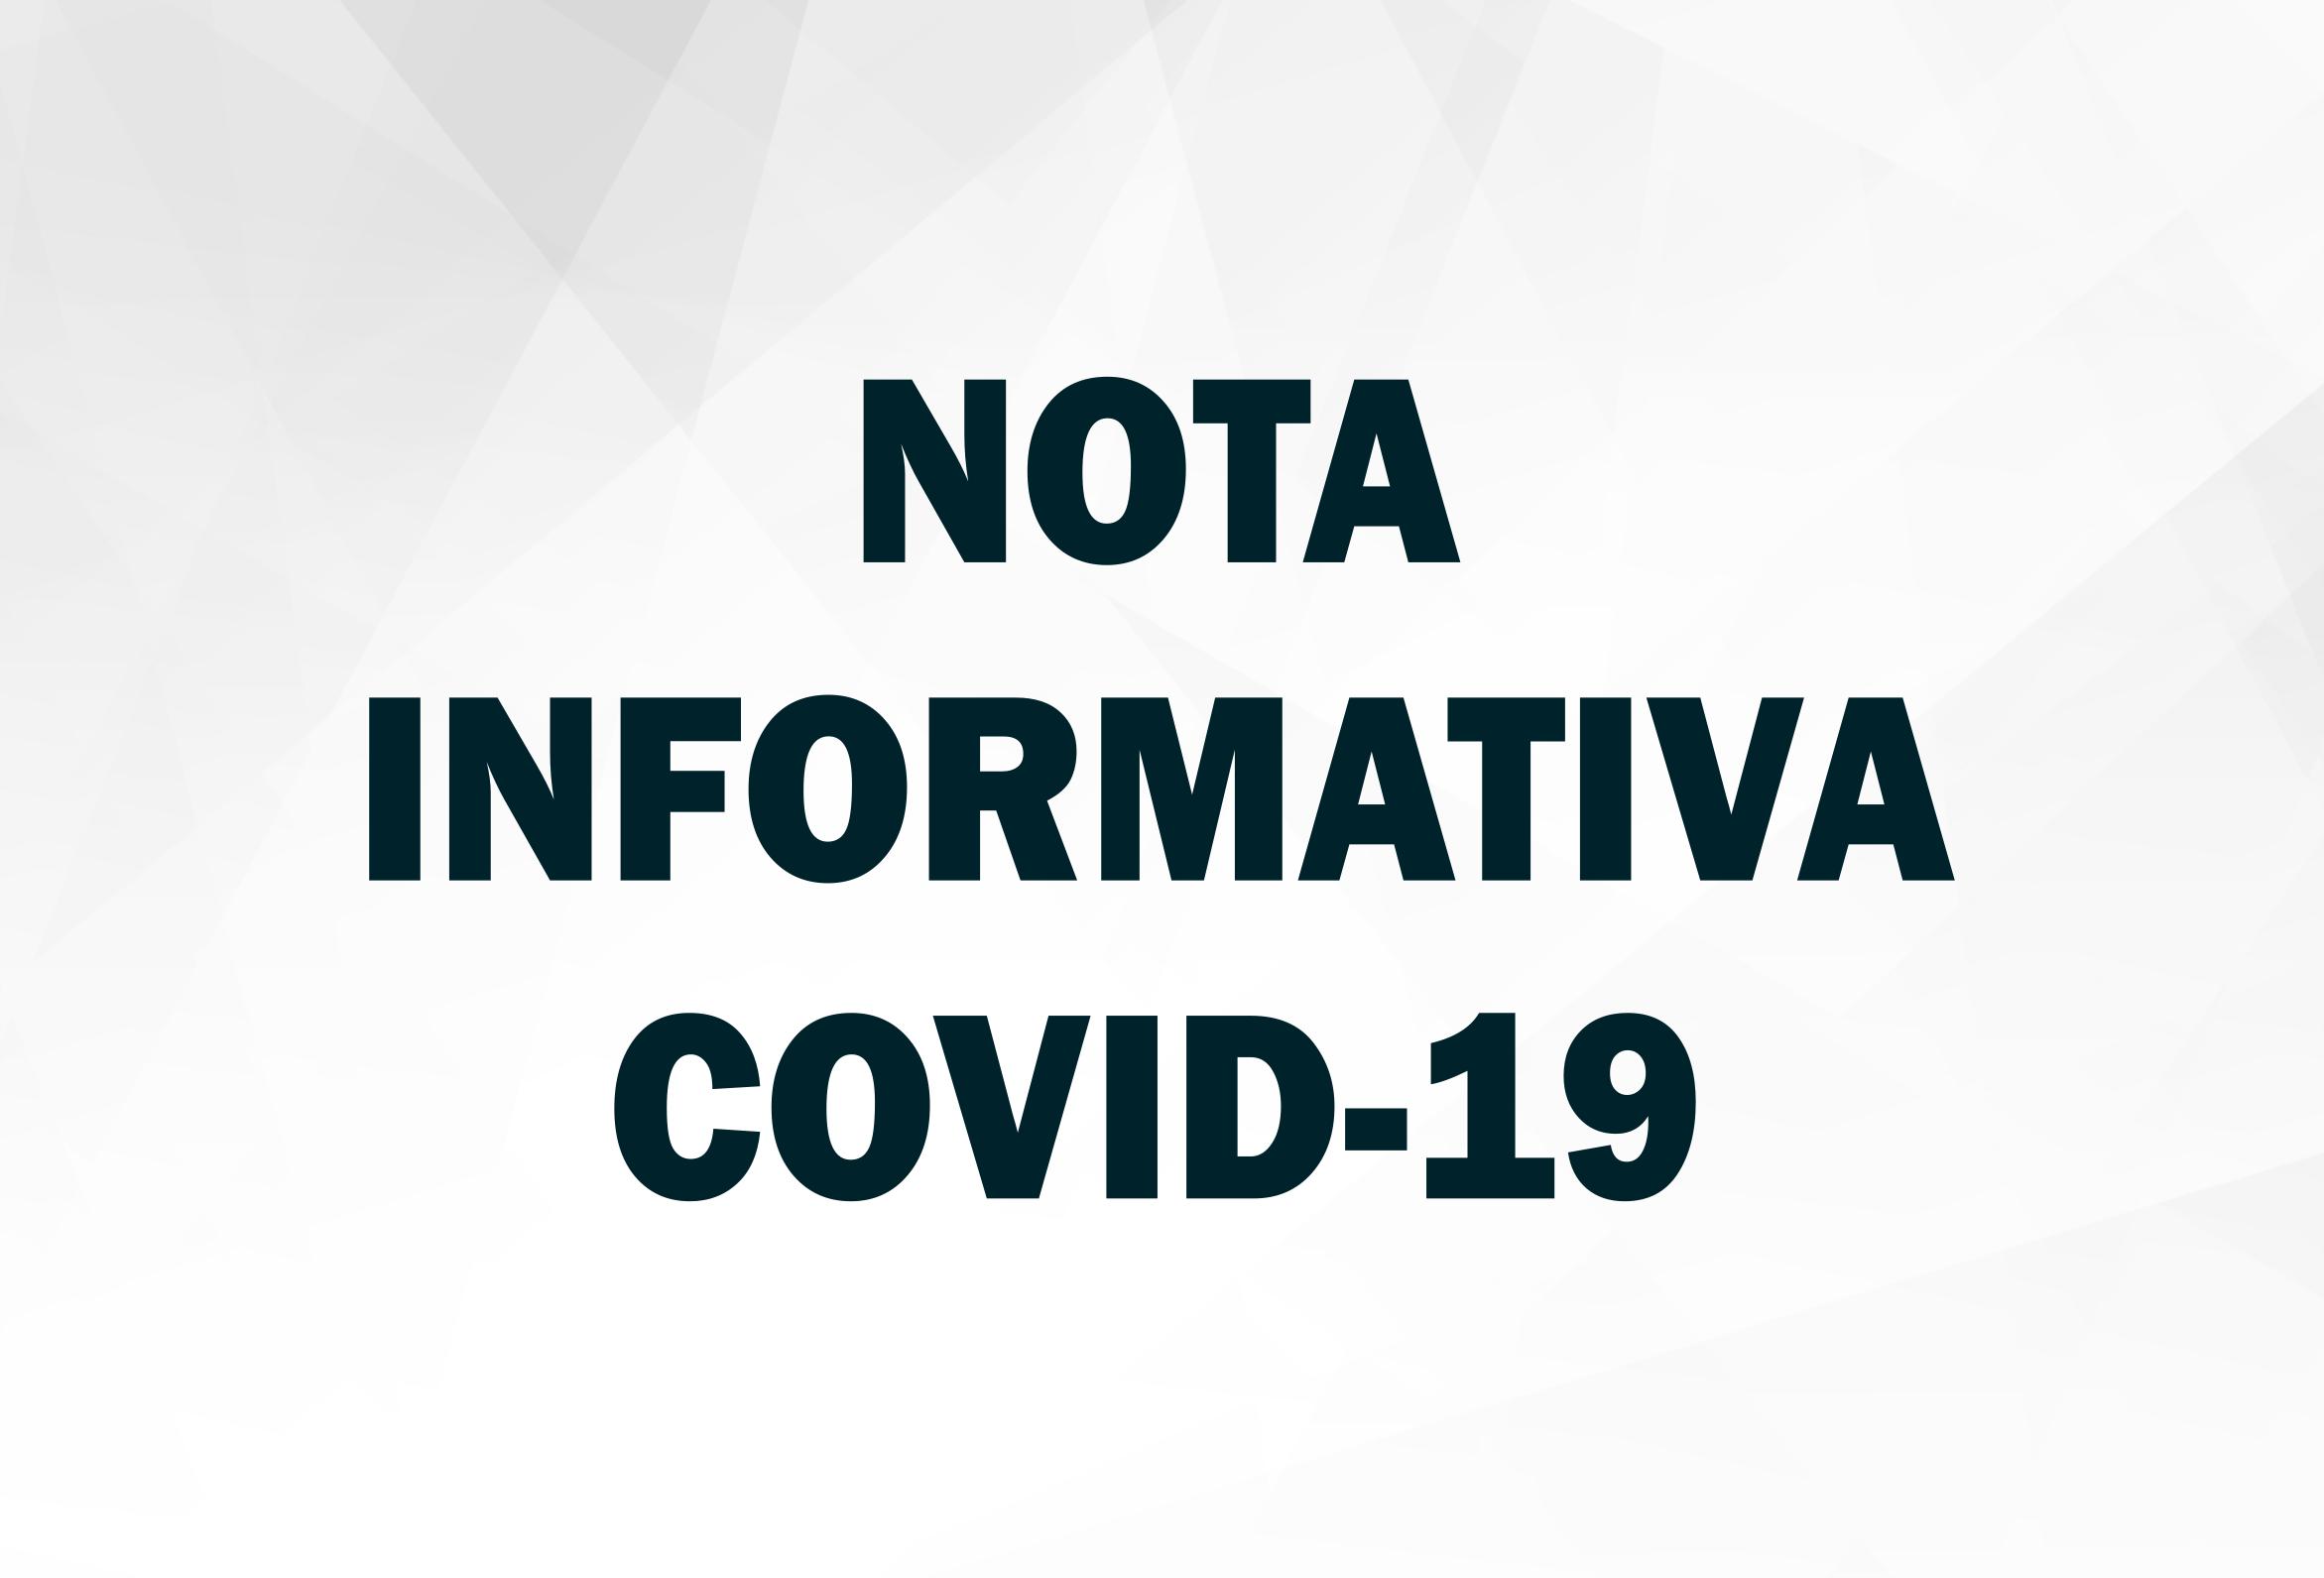 NOTA INFORMATIVA Nº 31/2021 (COVID-19)